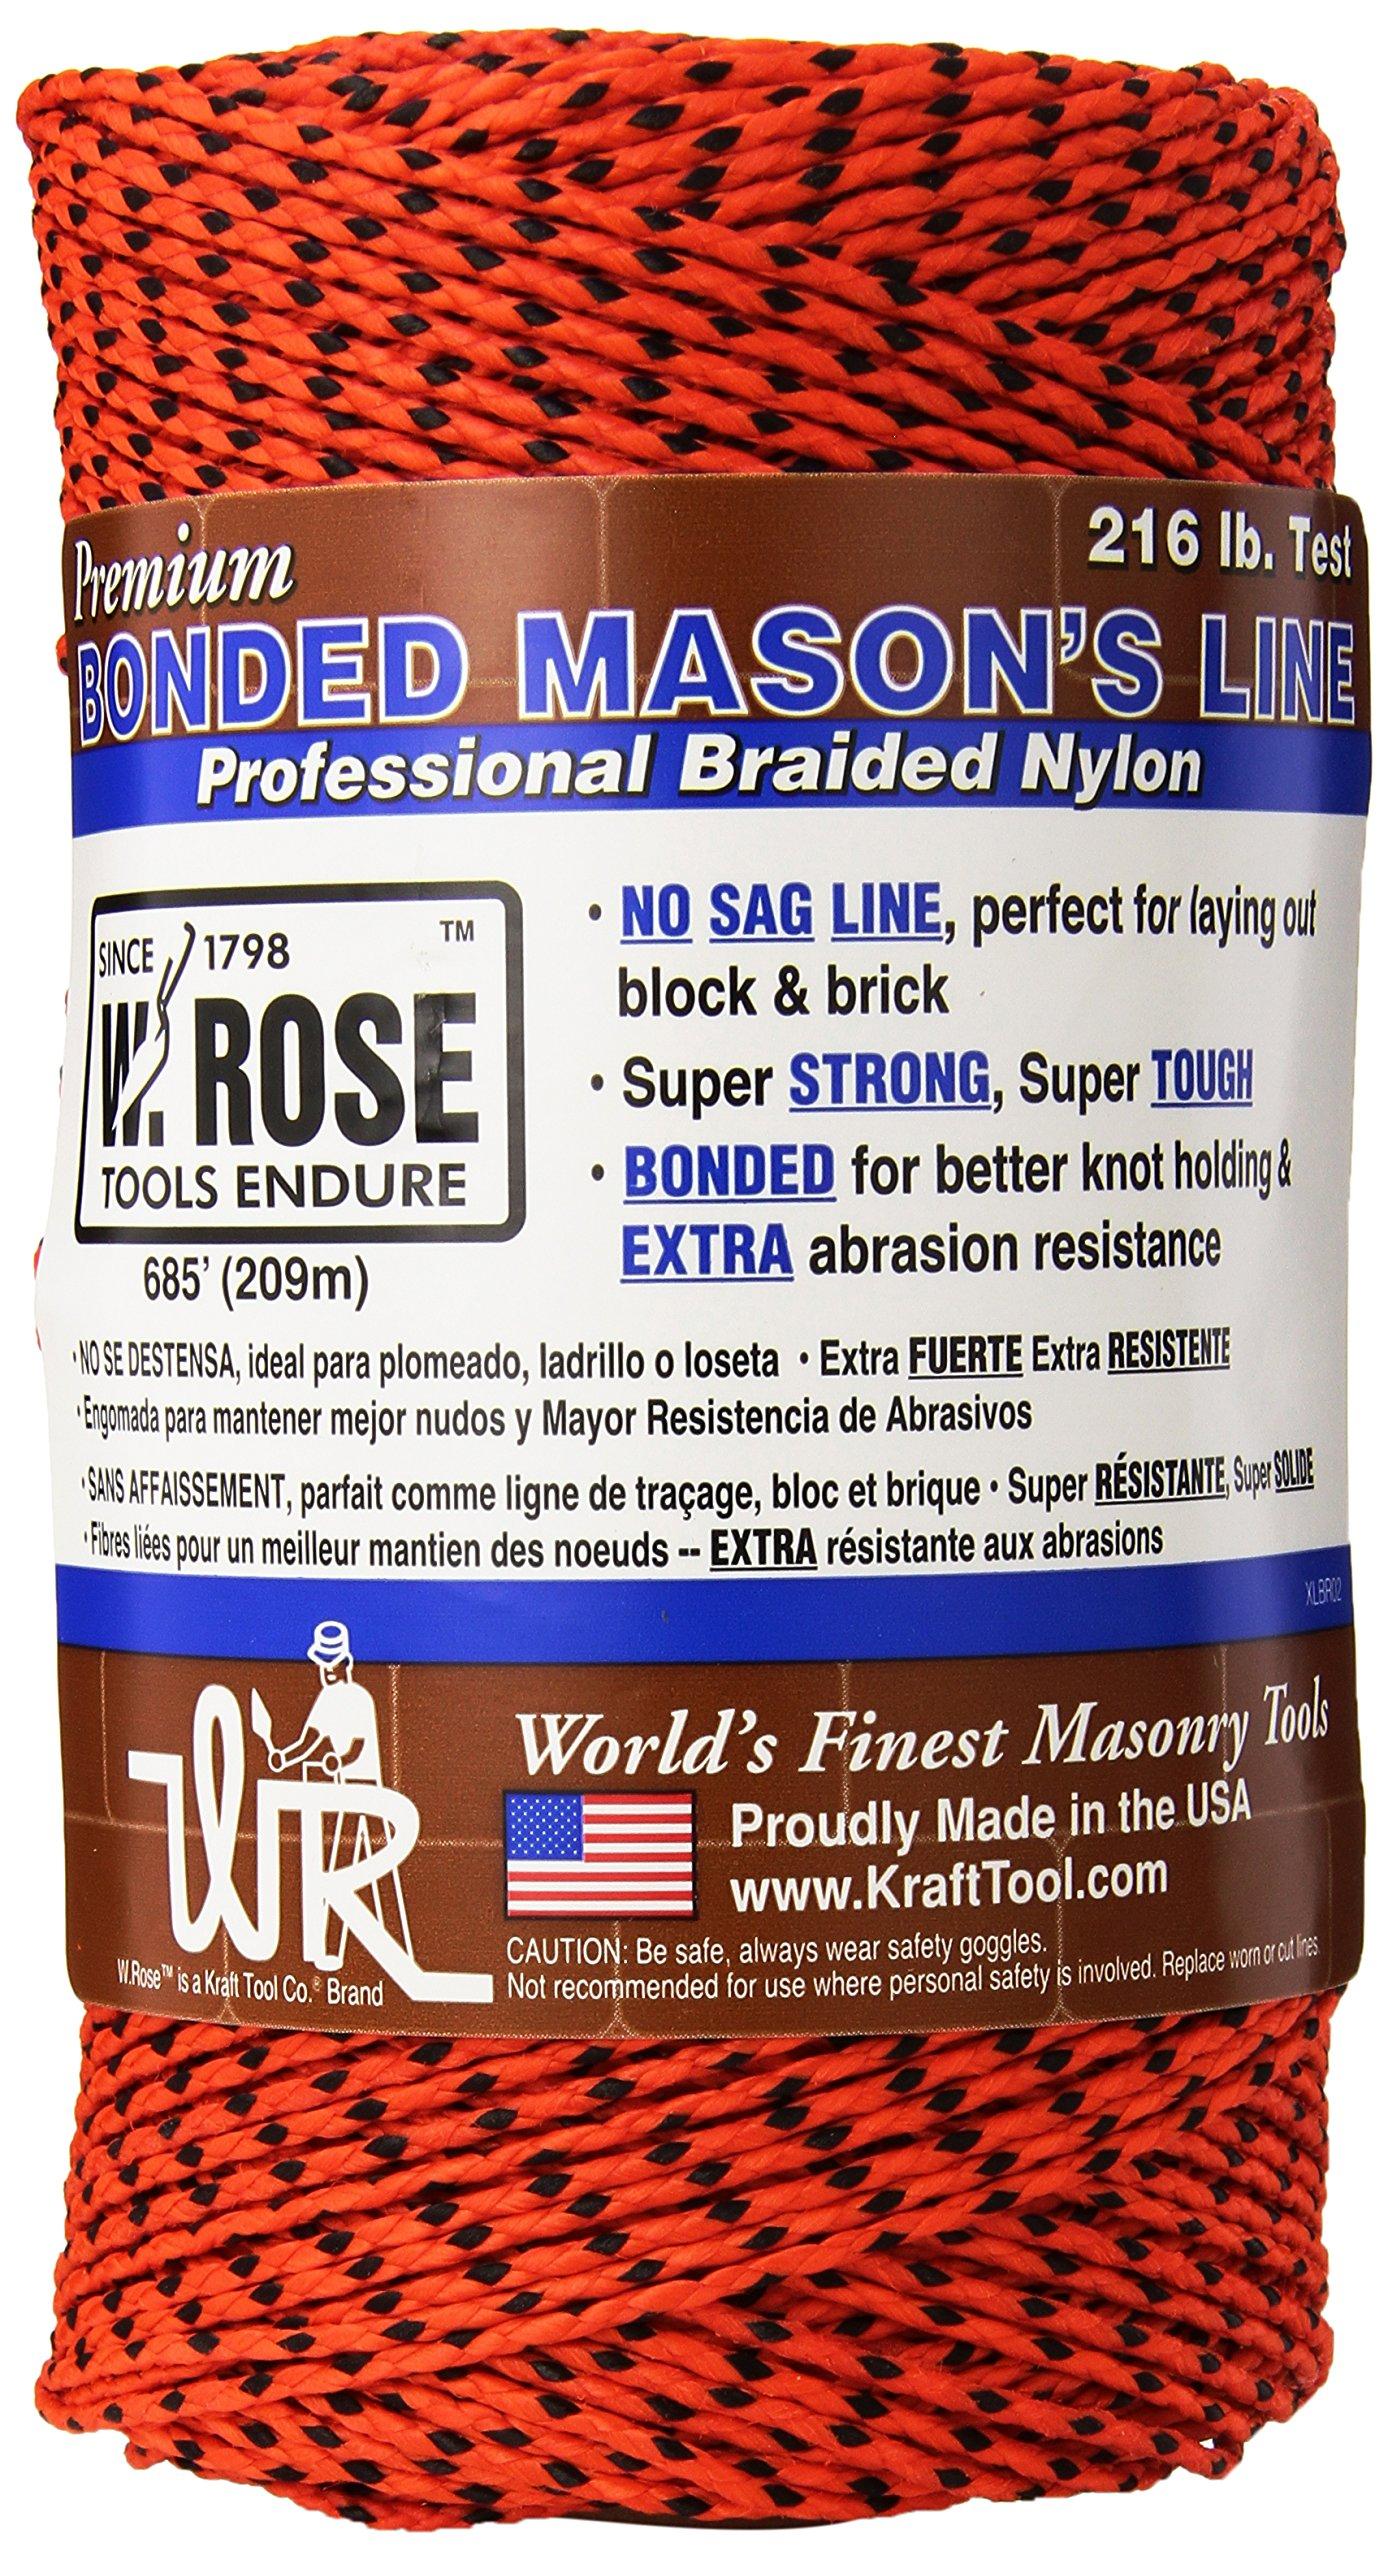 W. Rose RO686 Super Tough Professional Bonded Braided Nylon Mason's Line, 685-Feet, Orange/Black